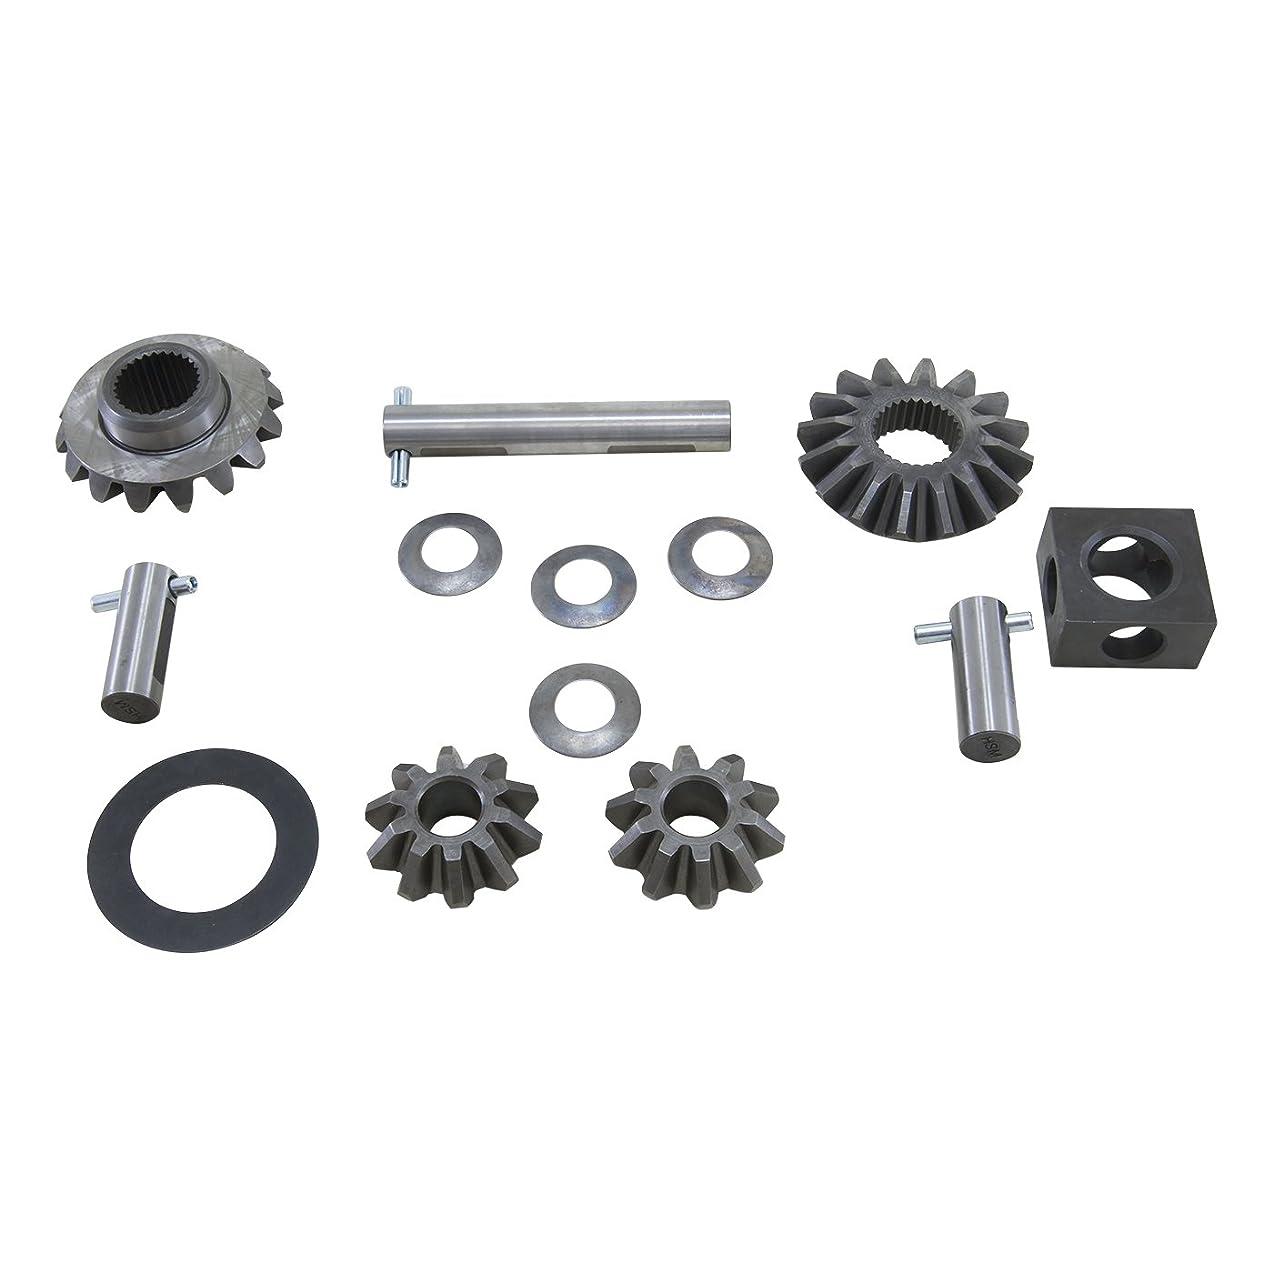 Yukon Gear & Axle (YPKF9-P-28-2) Positraction Internal for 28-Spline Ford 8/9 Differential